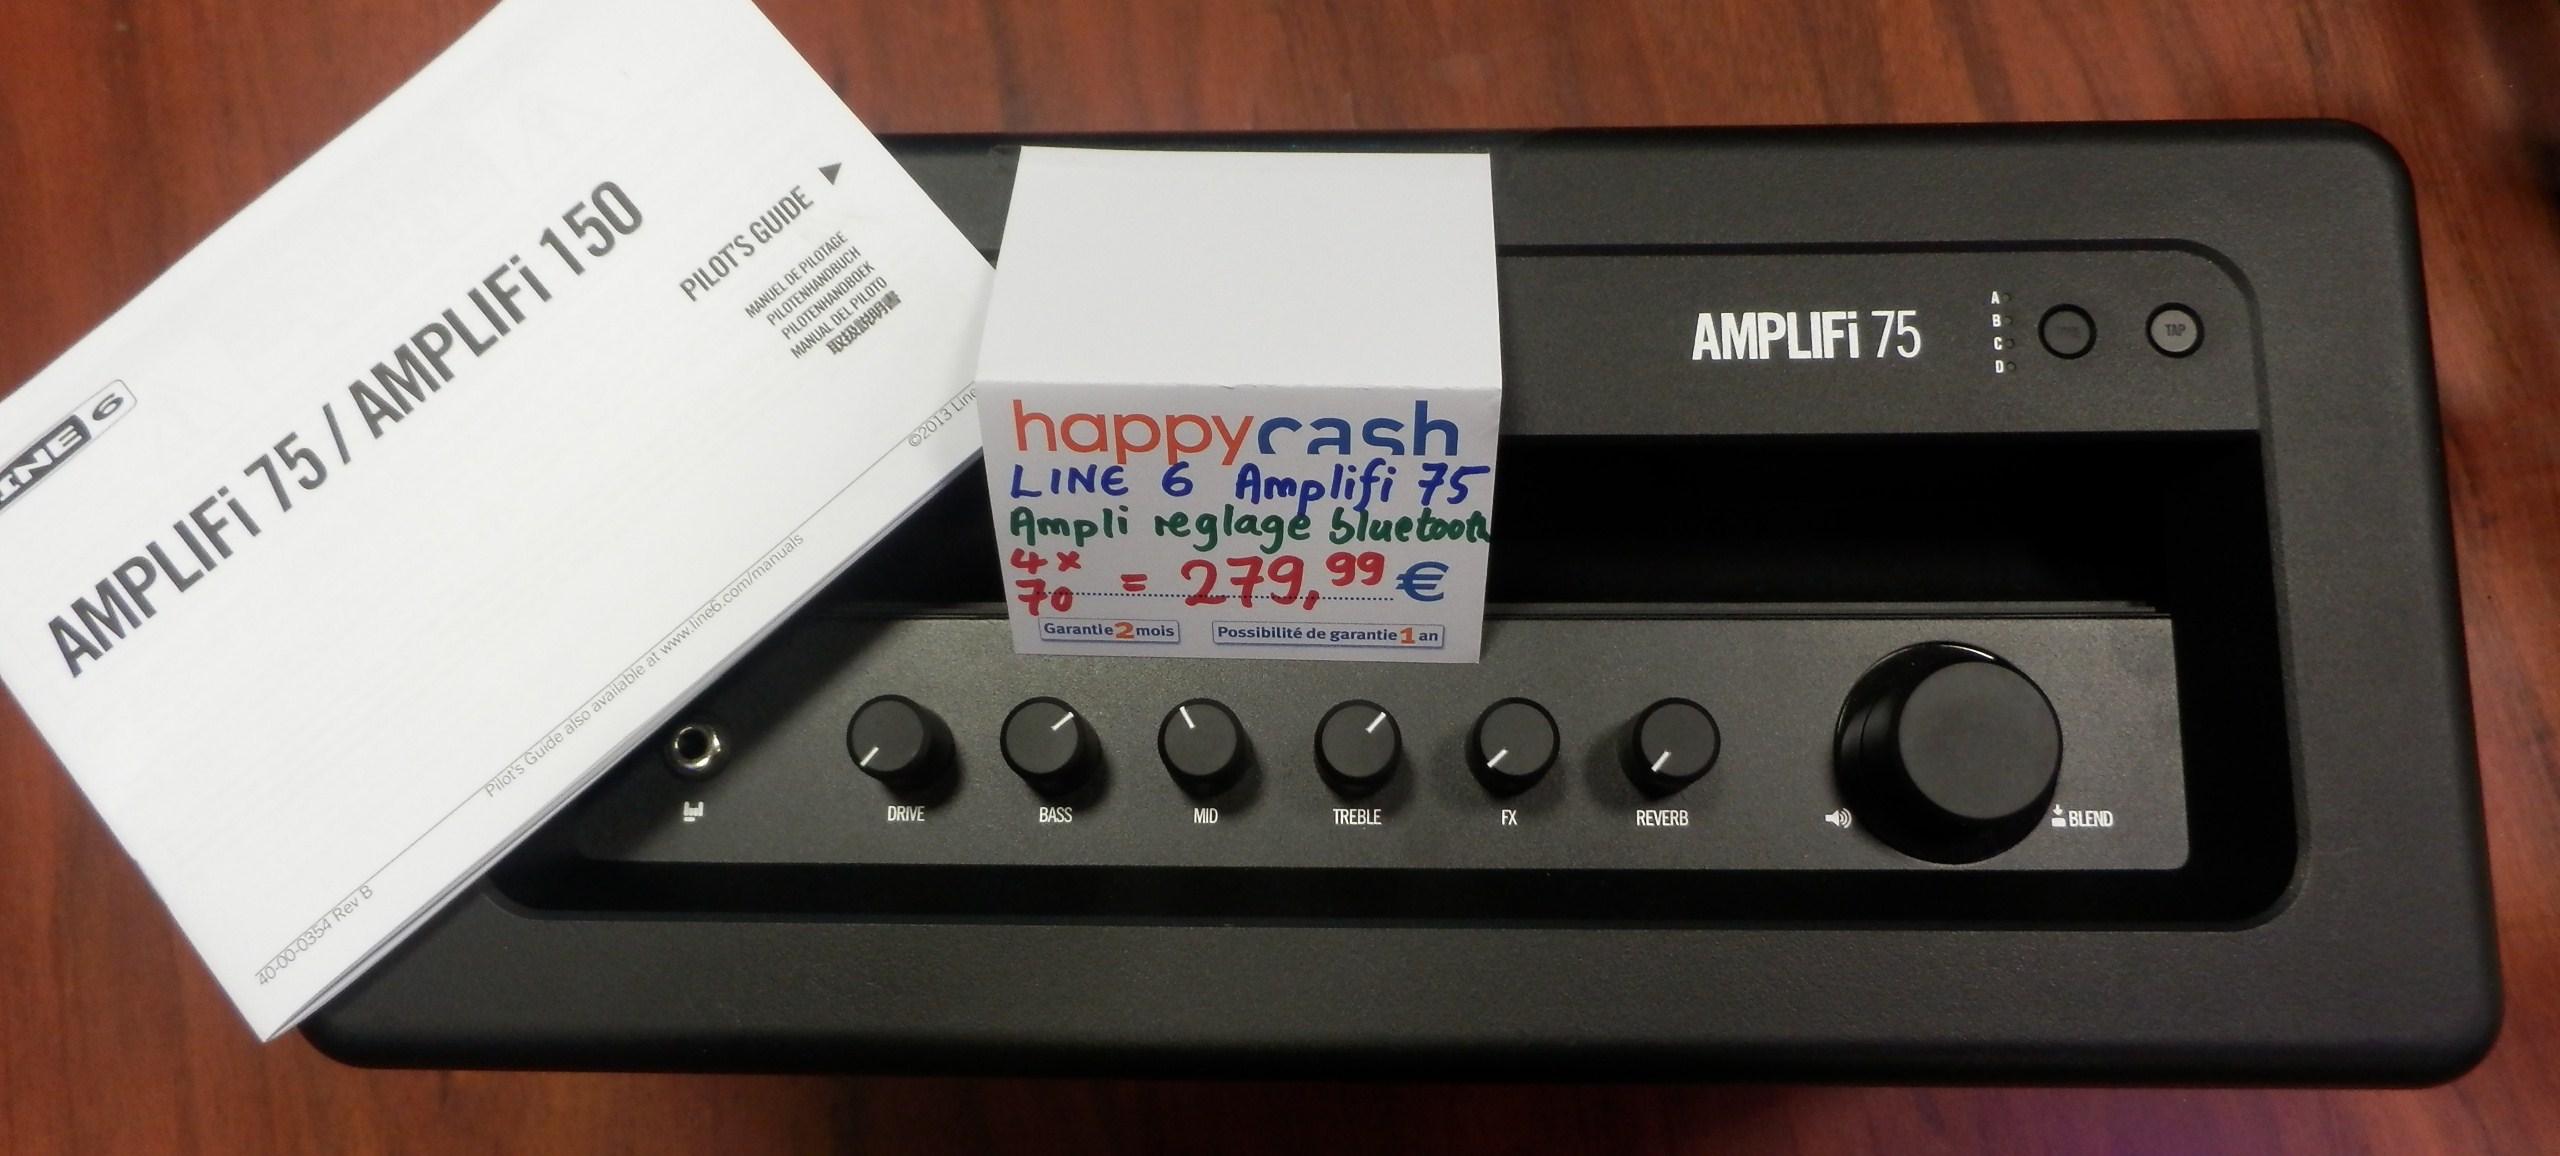 line 6 amplifi 75 image 803648 audiofanzine. Black Bedroom Furniture Sets. Home Design Ideas